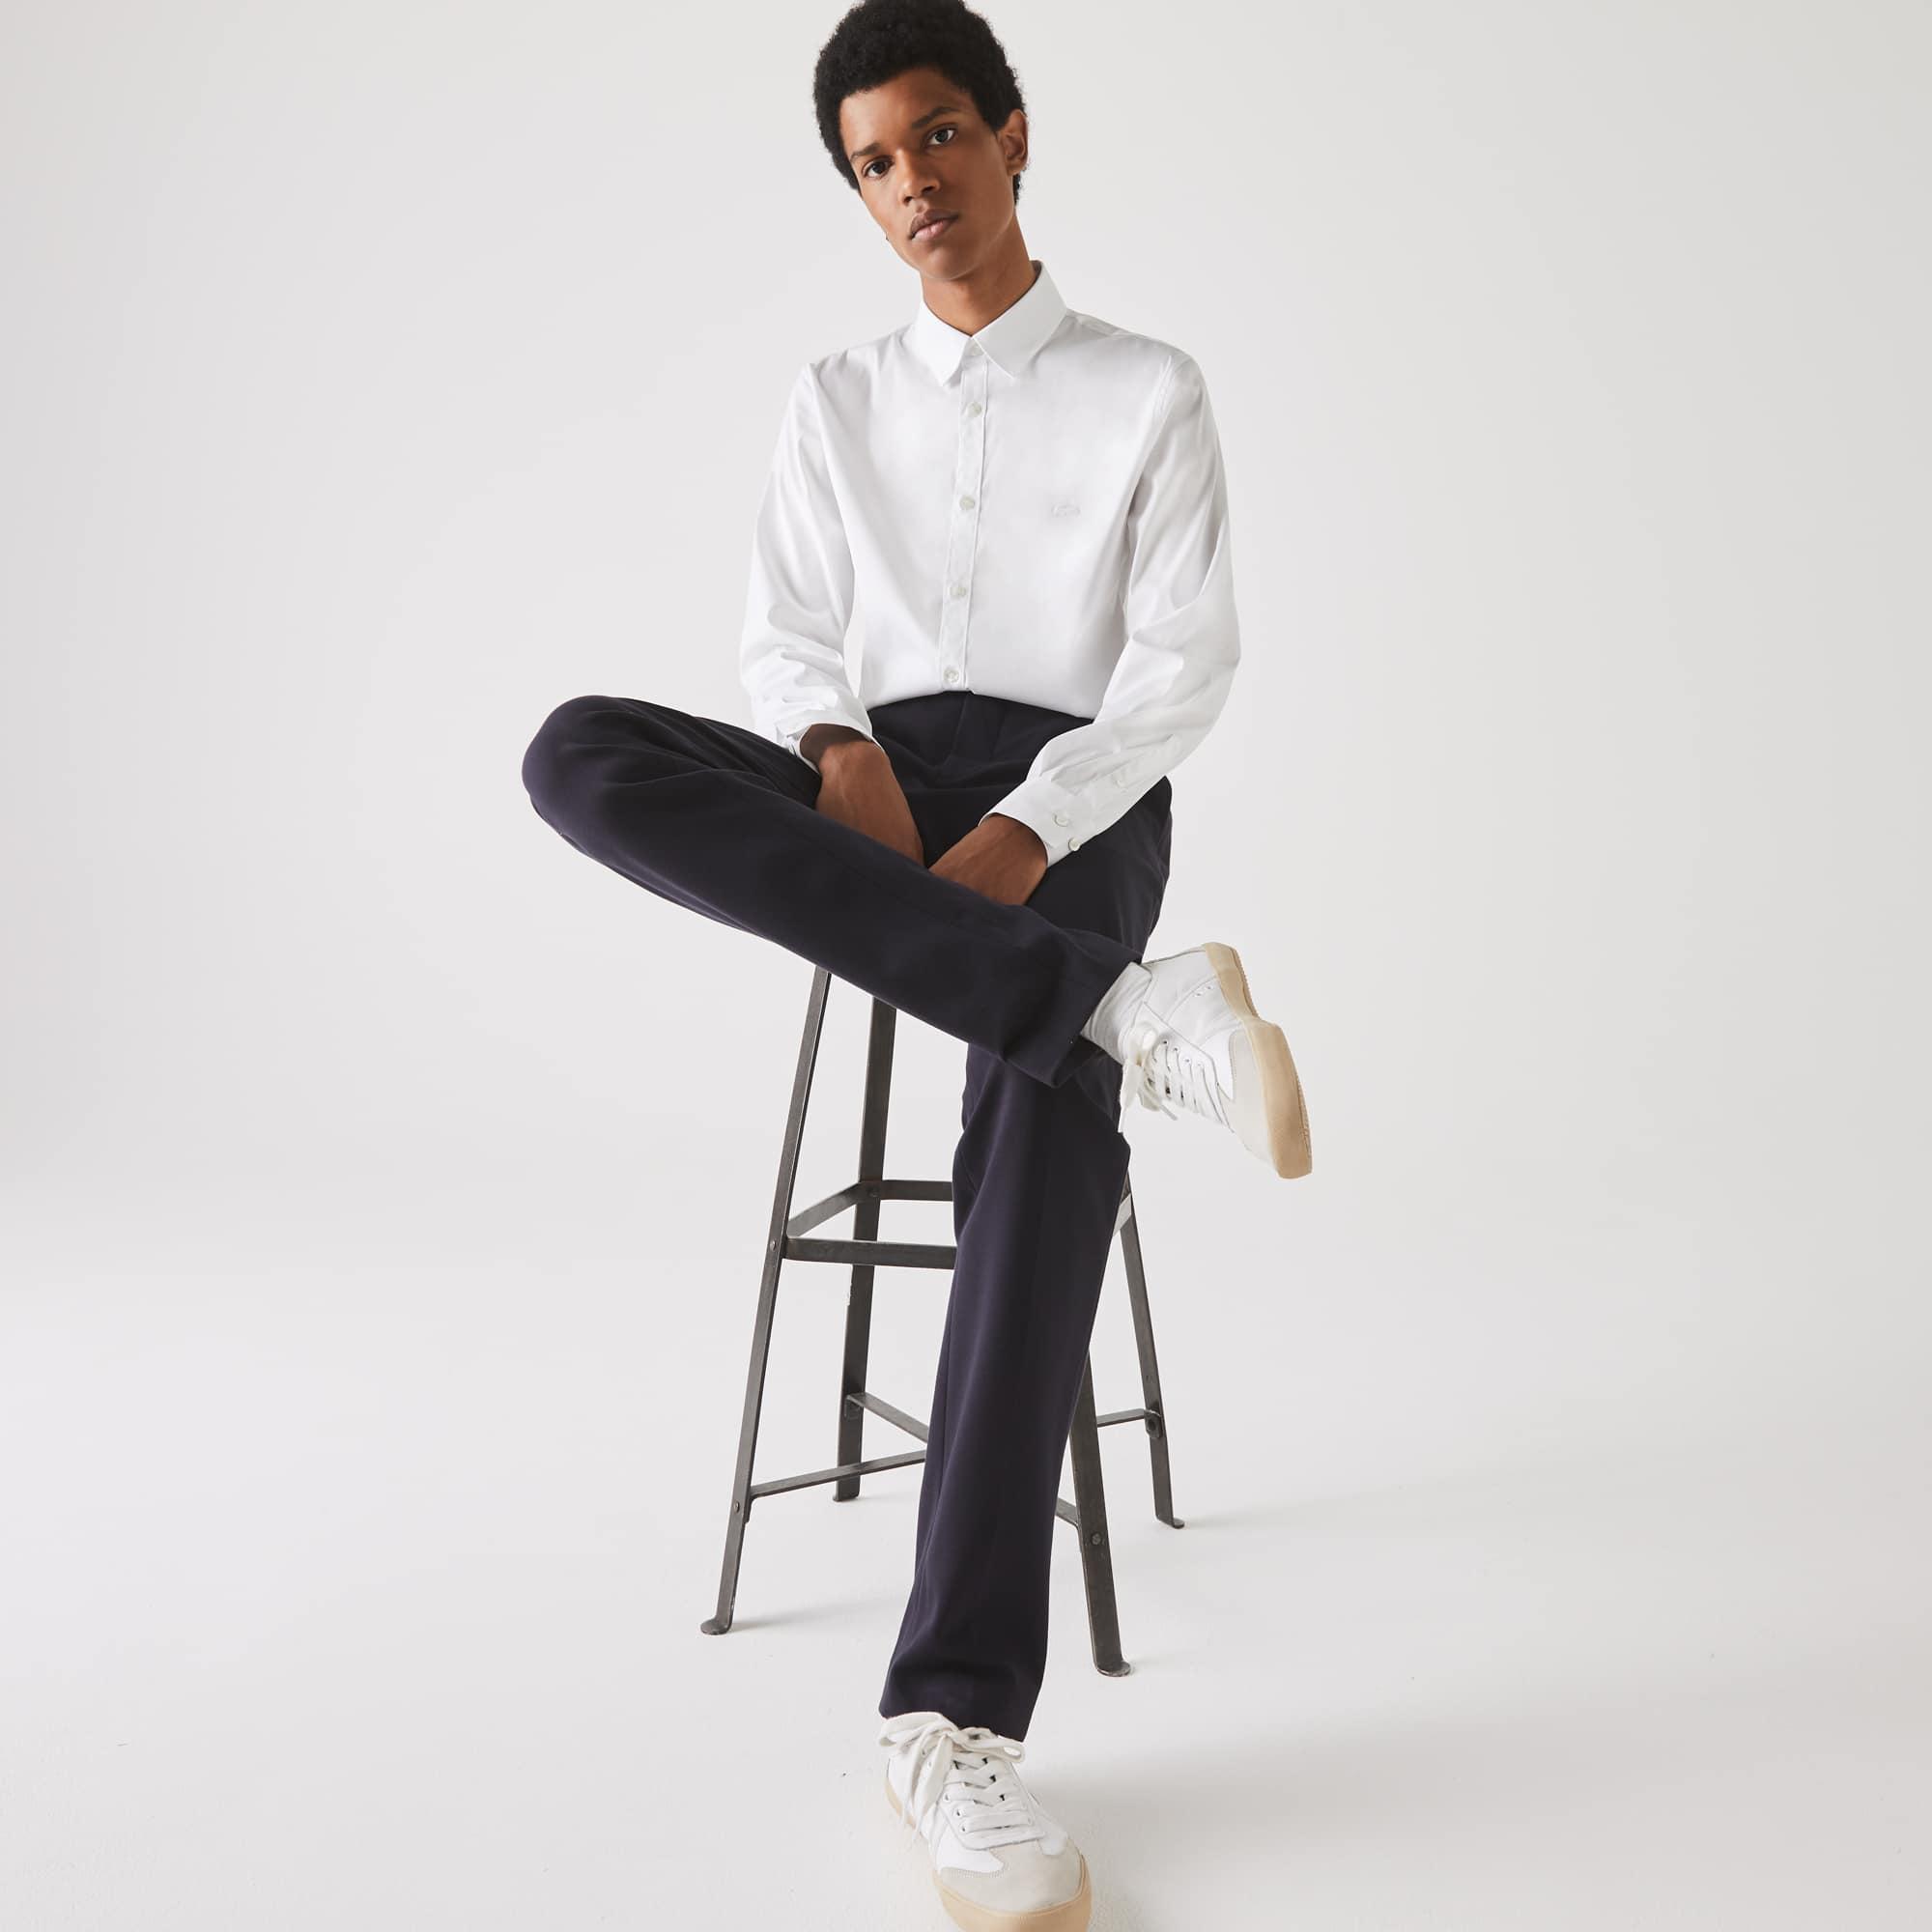 Lacoste Tops Men's Slim Fit Stretch Cotton Poplin Shirt